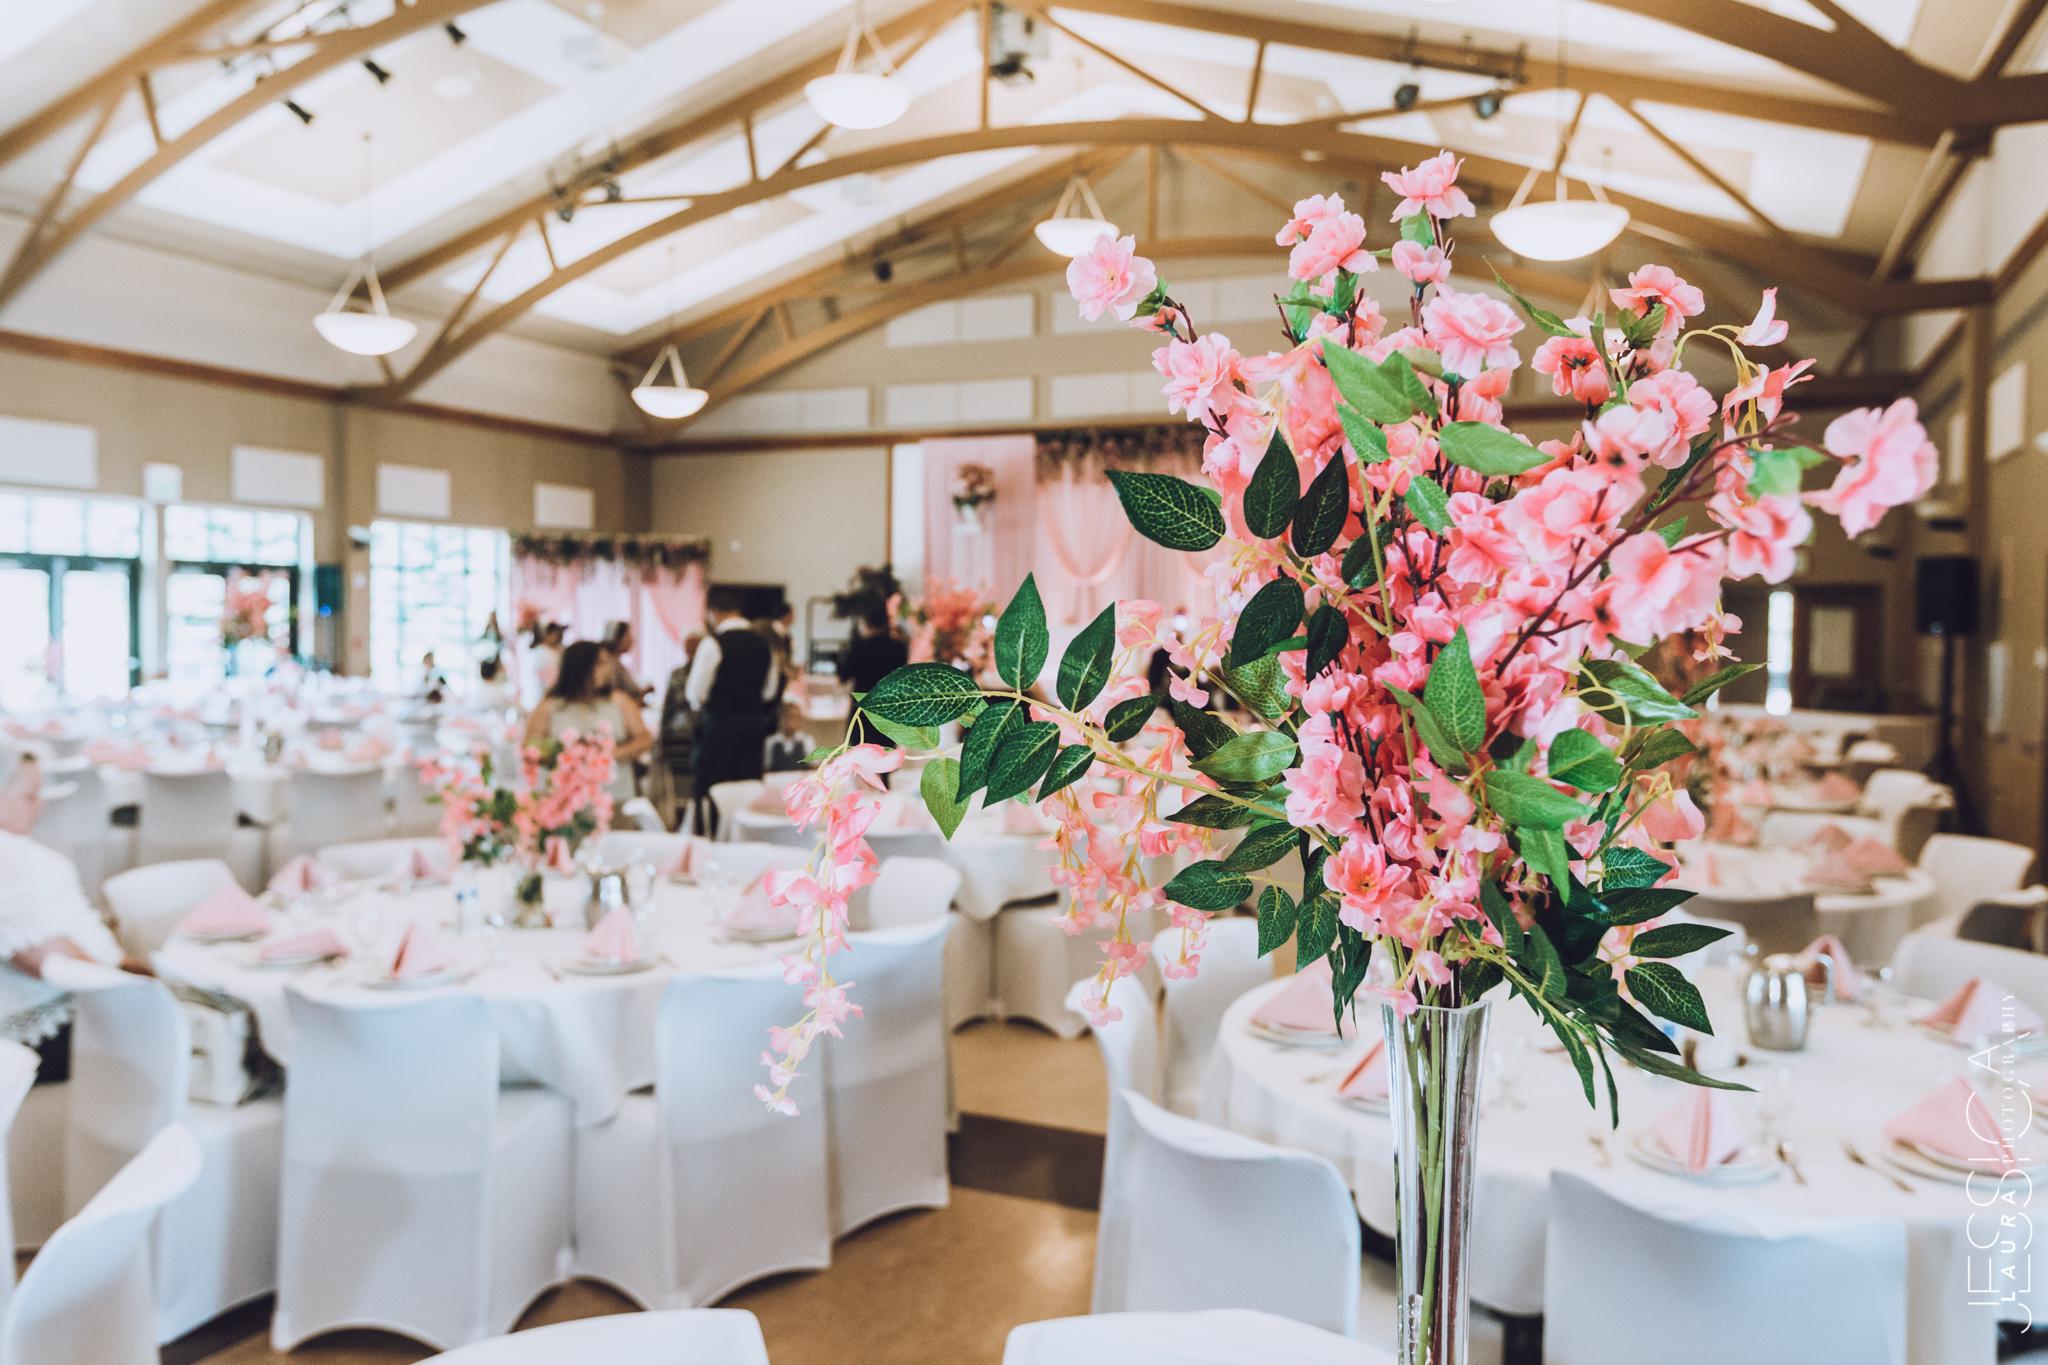 Eugene-Maryana_wedding_08062017_web (246 of 558).JPG